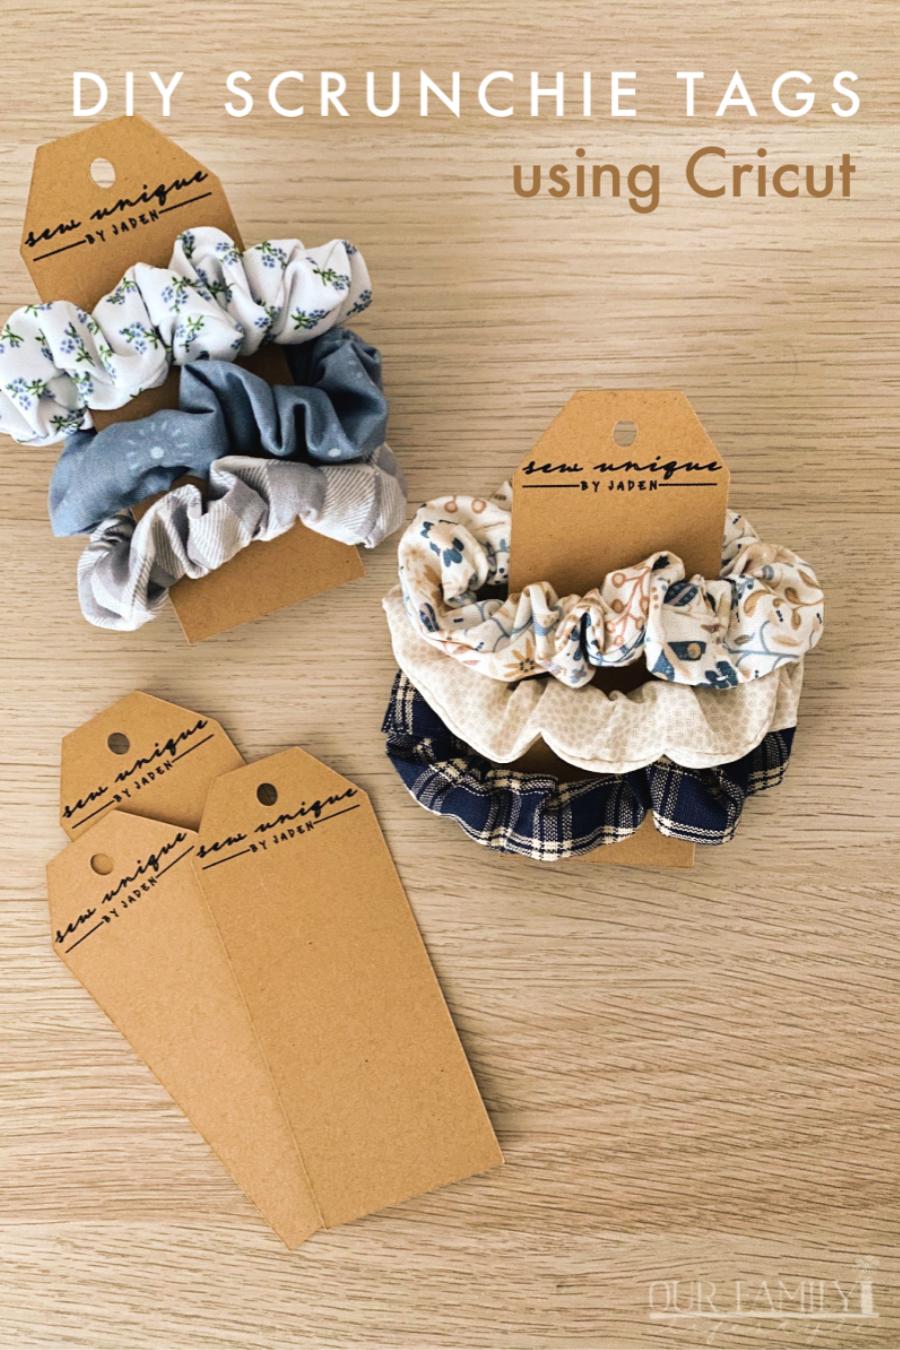 DIY scrunchie tags using Cricut